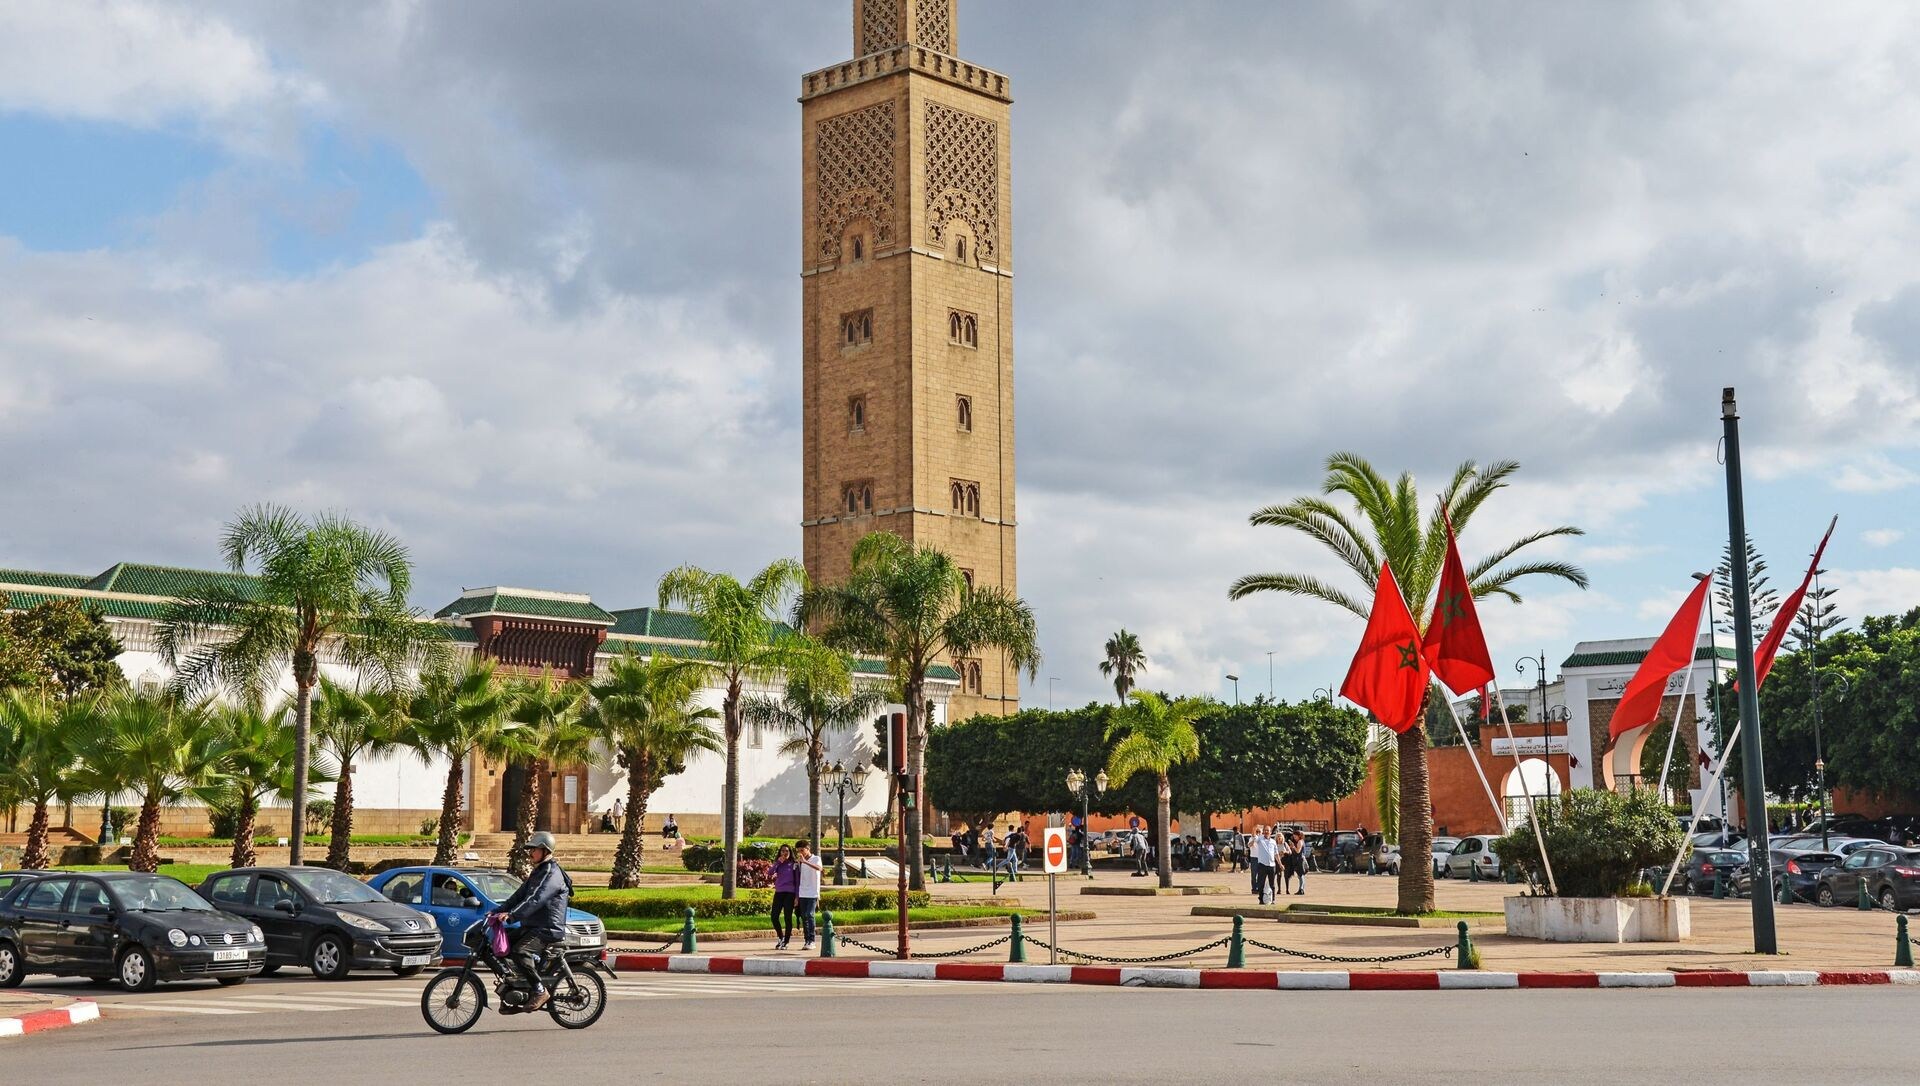 Rabat, Maroc - Sputnik France, 1920, 11.09.2021